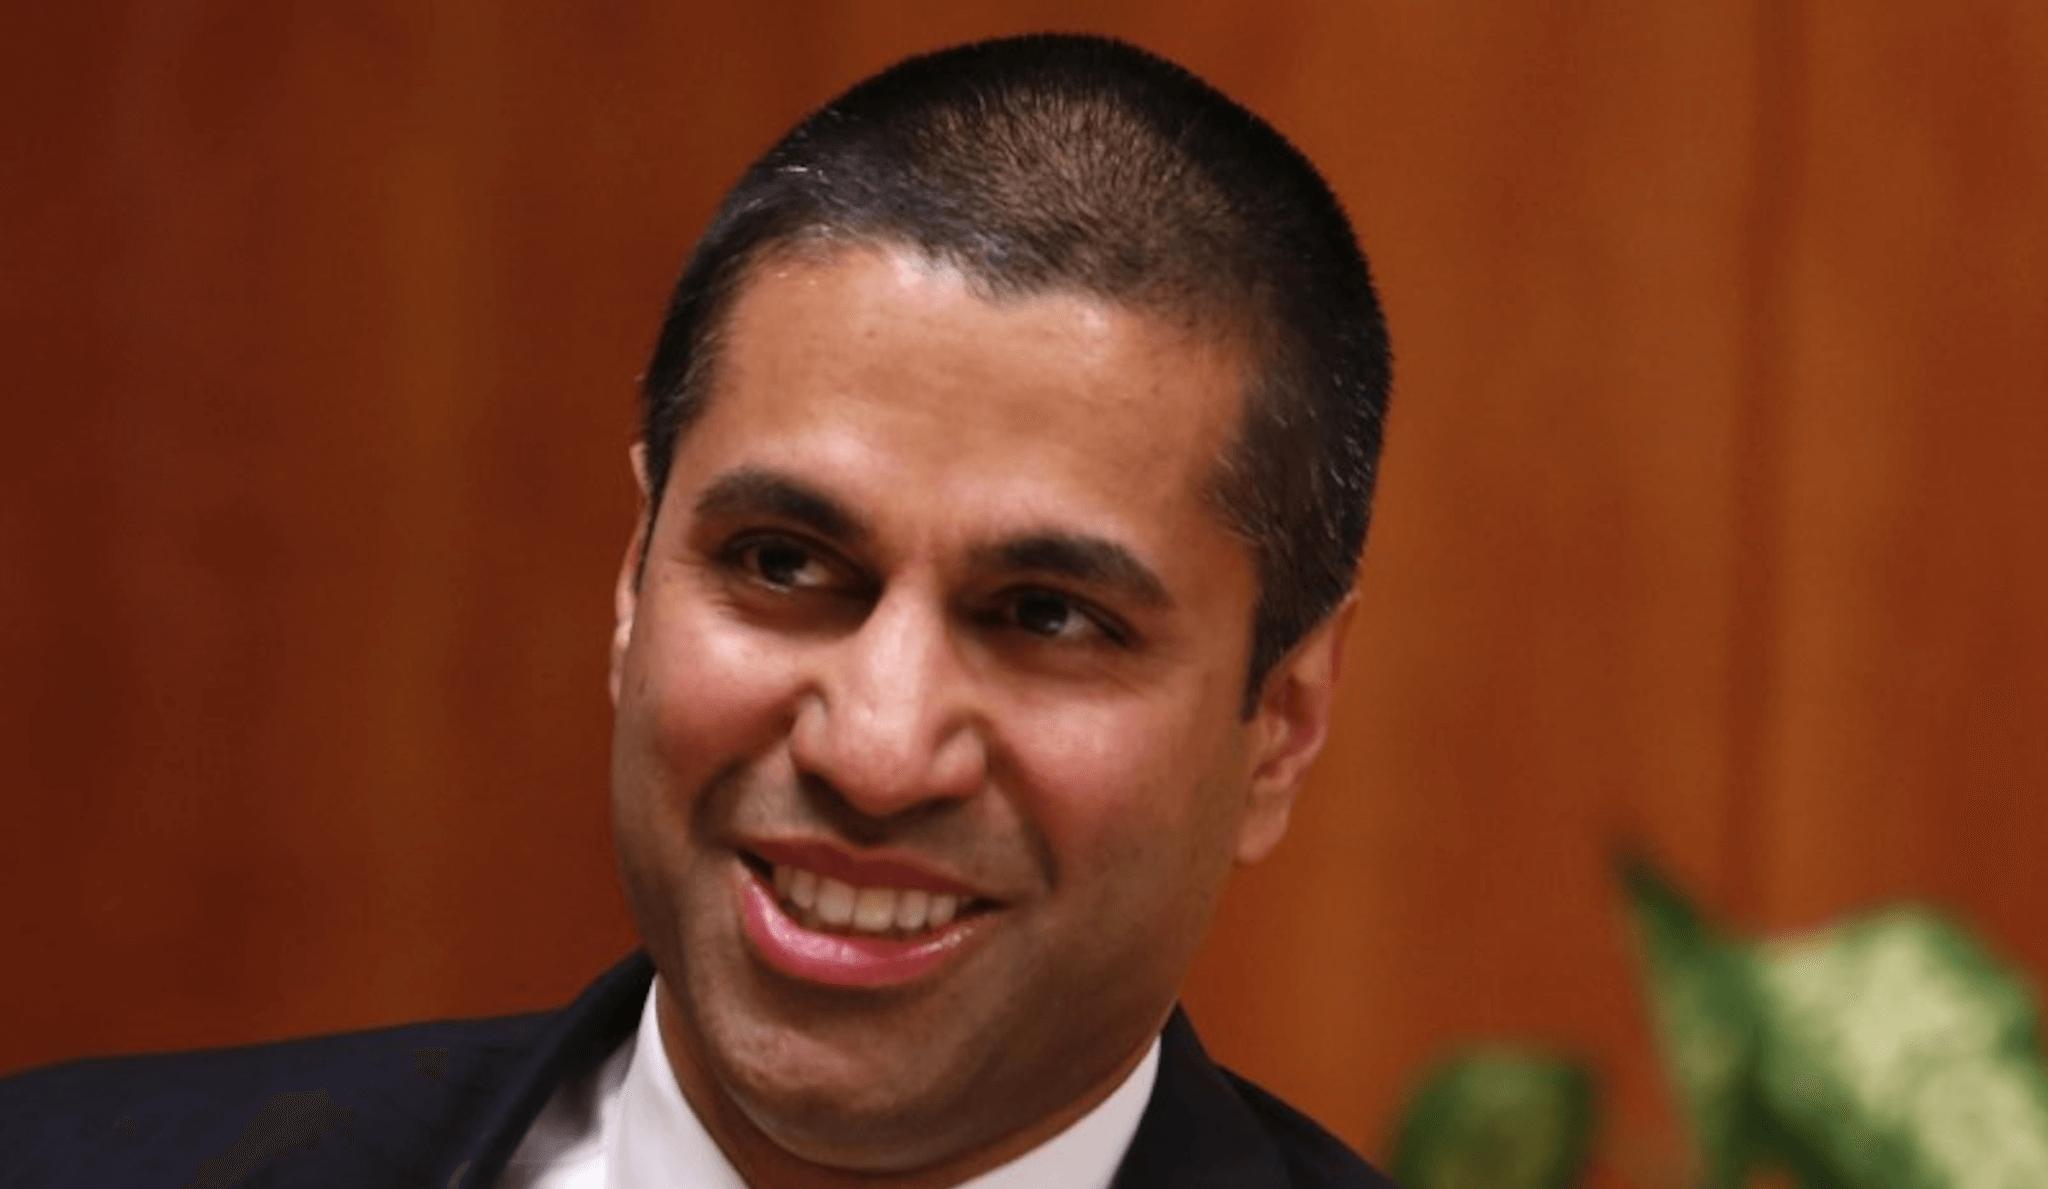 Net Neutrality: Look, We've been Over this